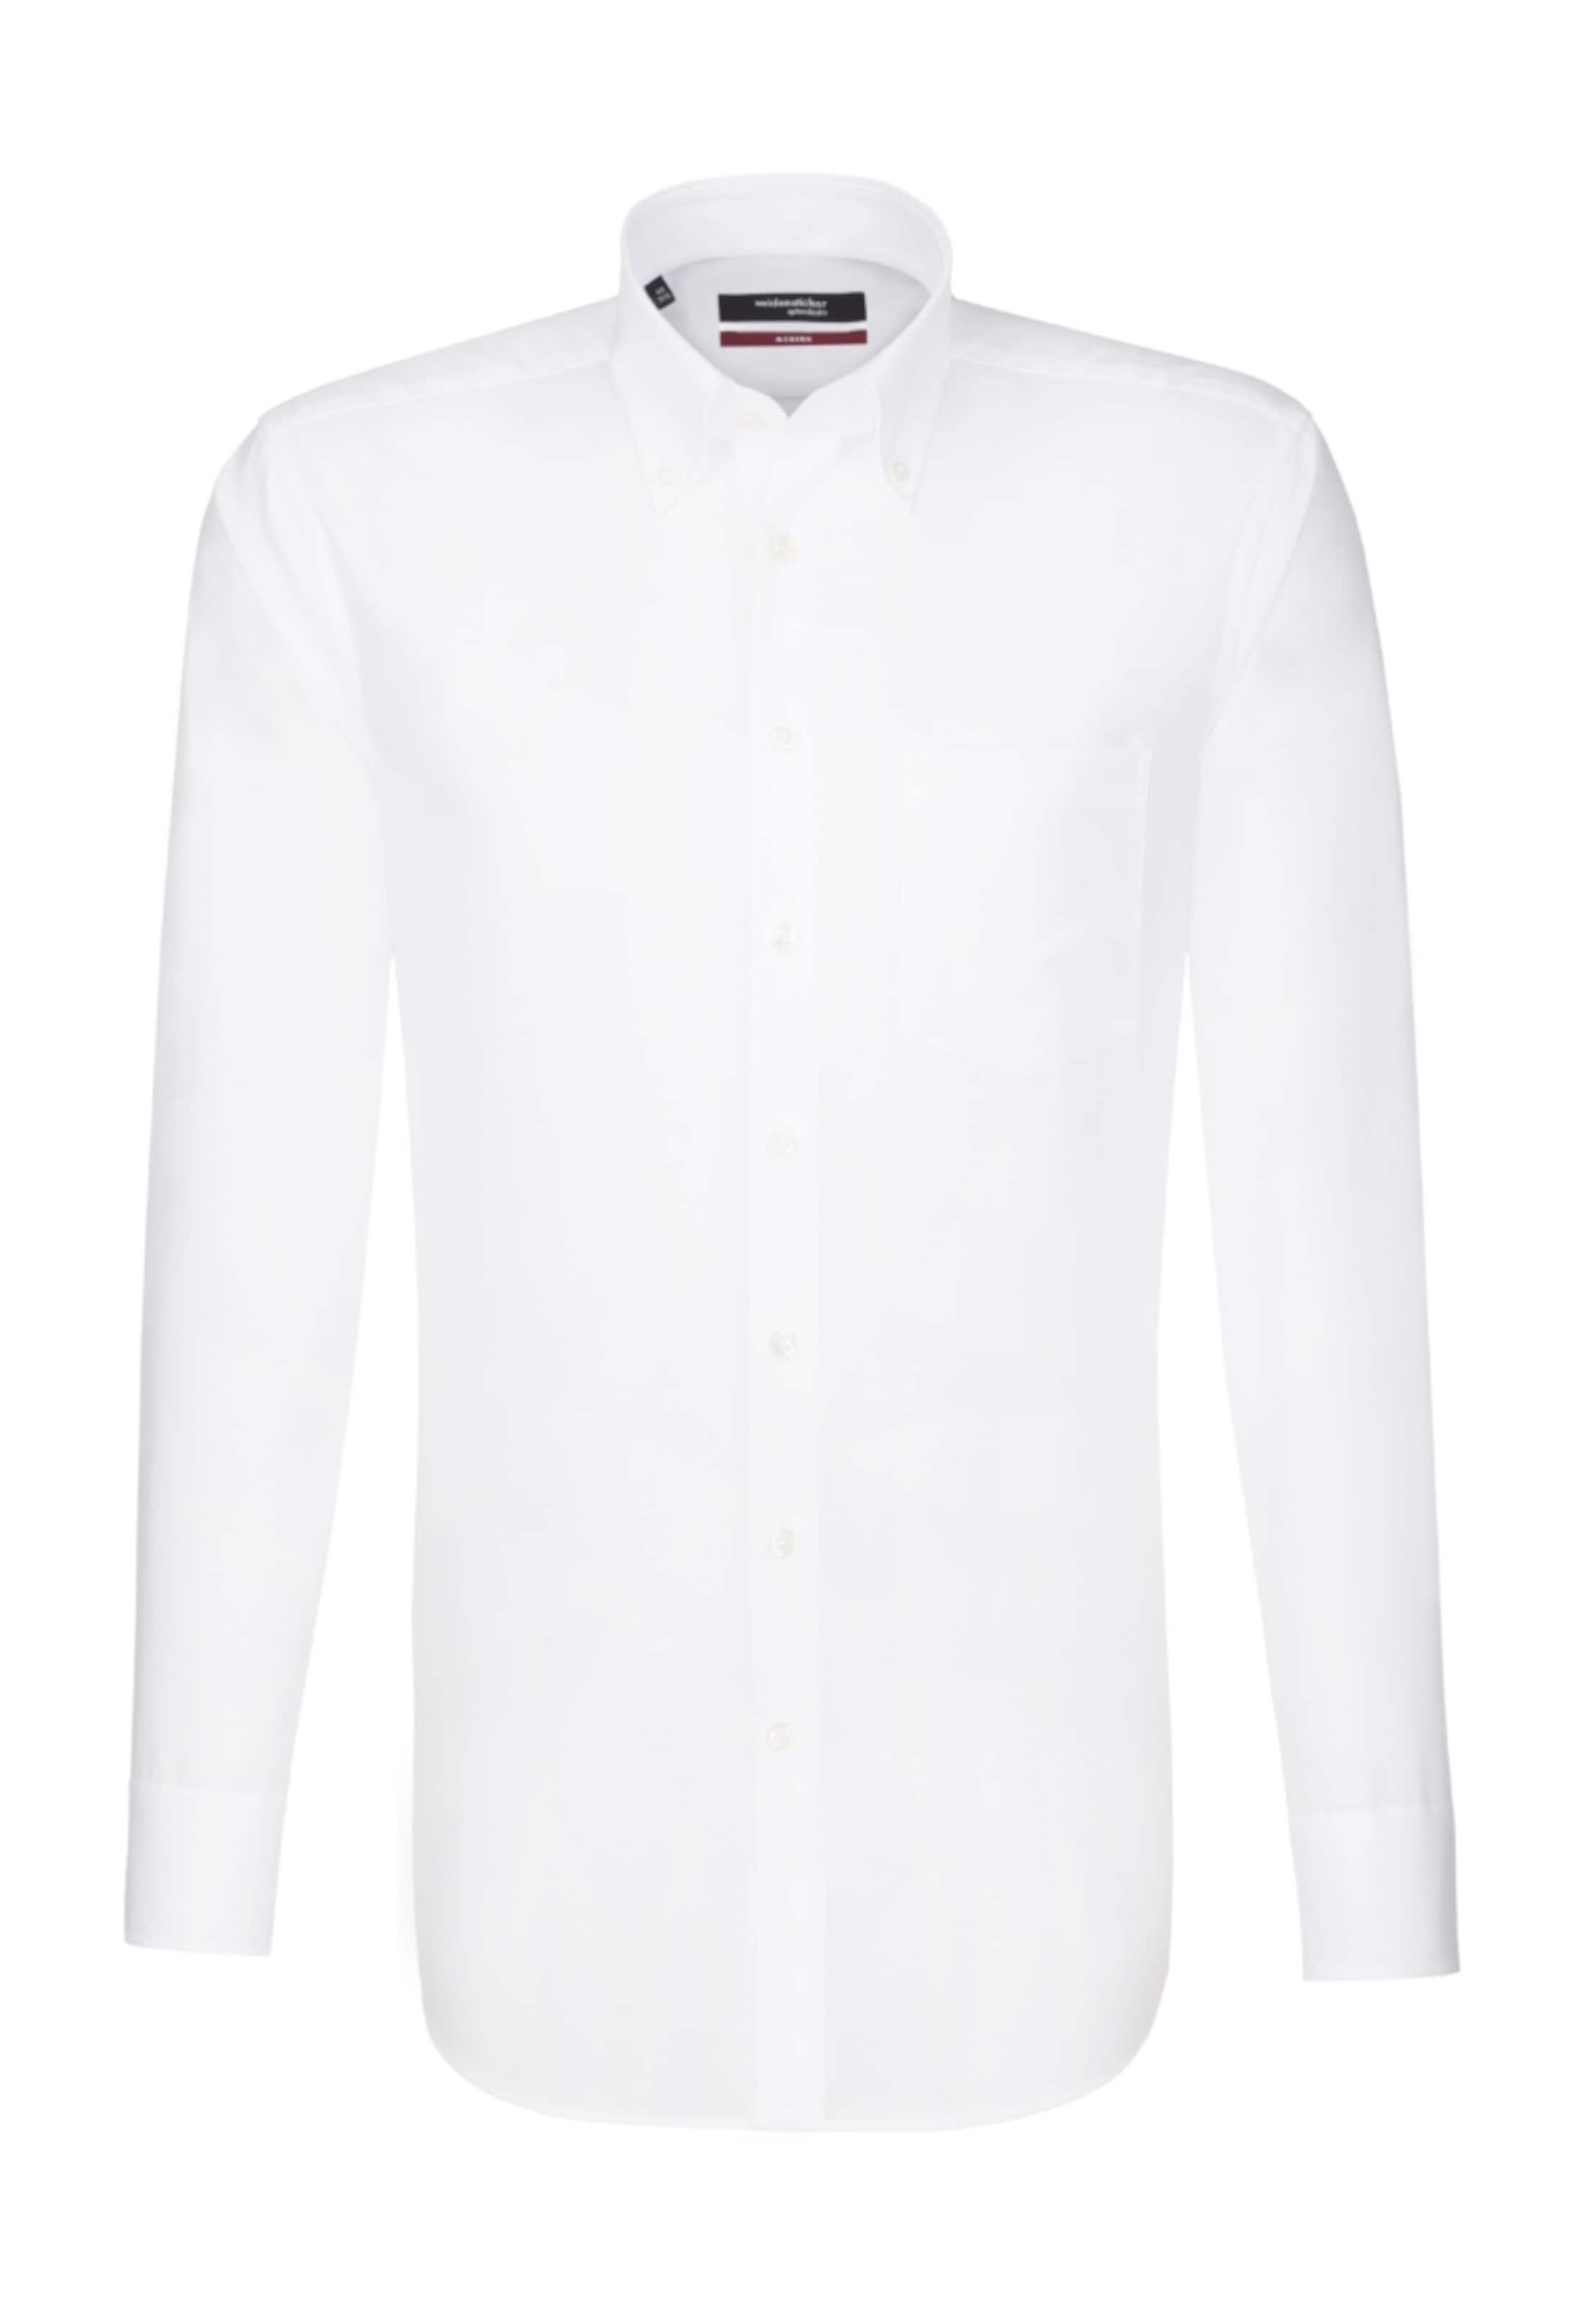 In Seidensticker hemd 'modern' City Weiß E2D9HWI